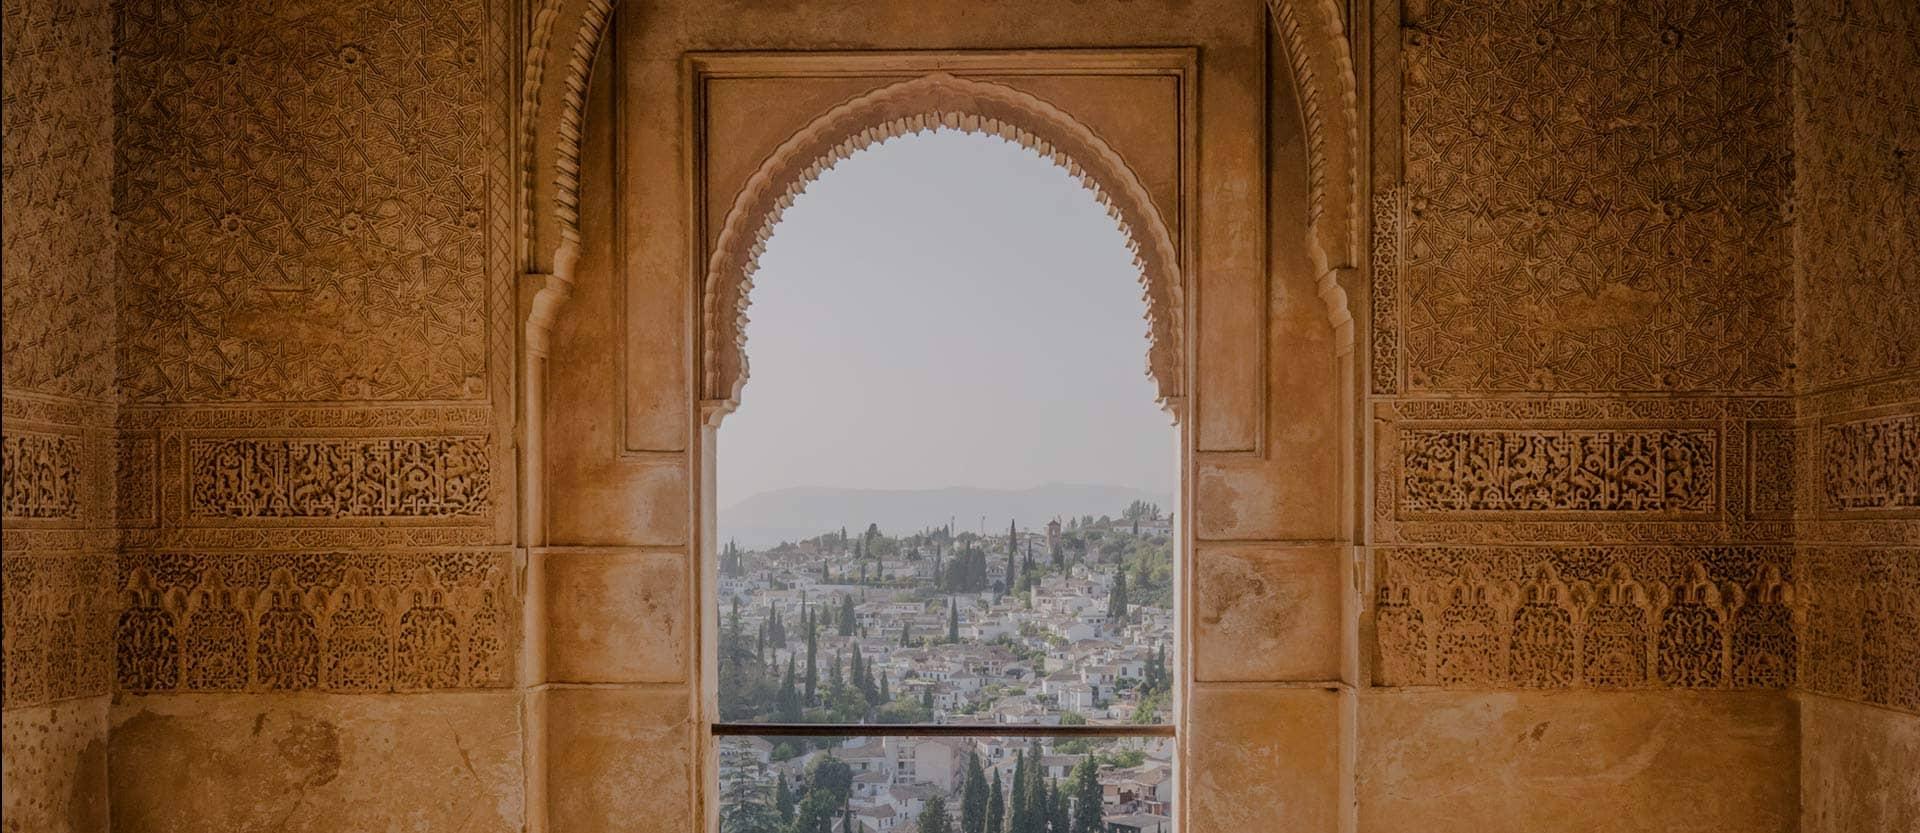 Las mejores visitas guiadas de Córdoba